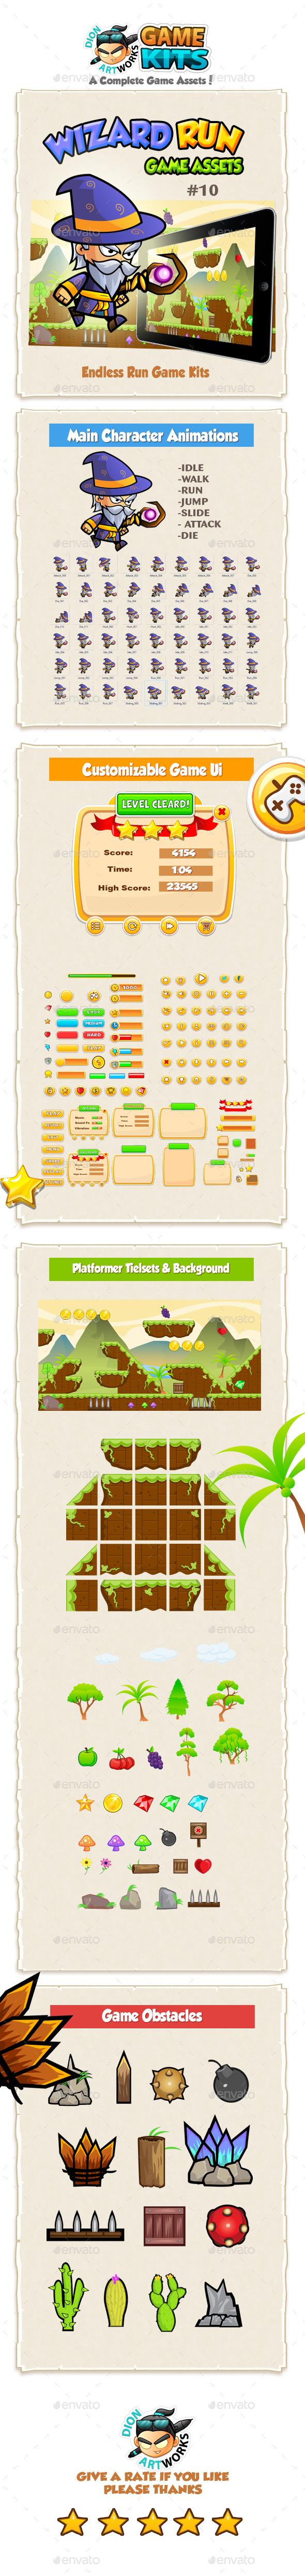 Wizard Run Game Assets 10 (Game Kits)